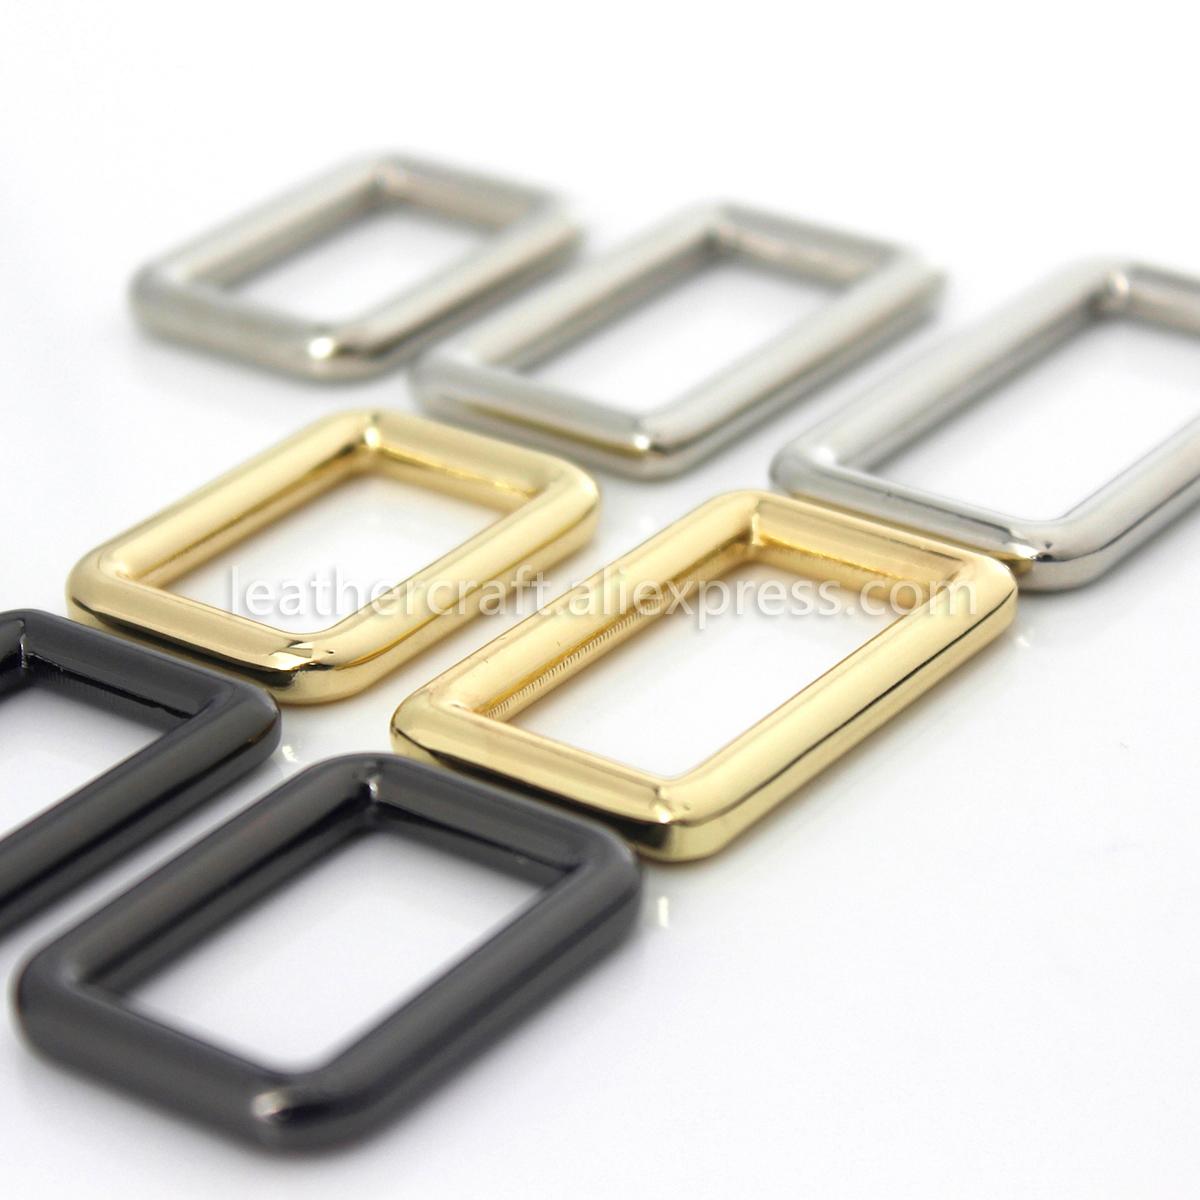 Silver, 20mm//3//4Inch Shapenty Metal Rectangle Loop Ring Webbing Belt Buckles for Bags Making Backpack Handbag Strap Purse Leatherwork Sewing Luggage DIY Craft 15PCS